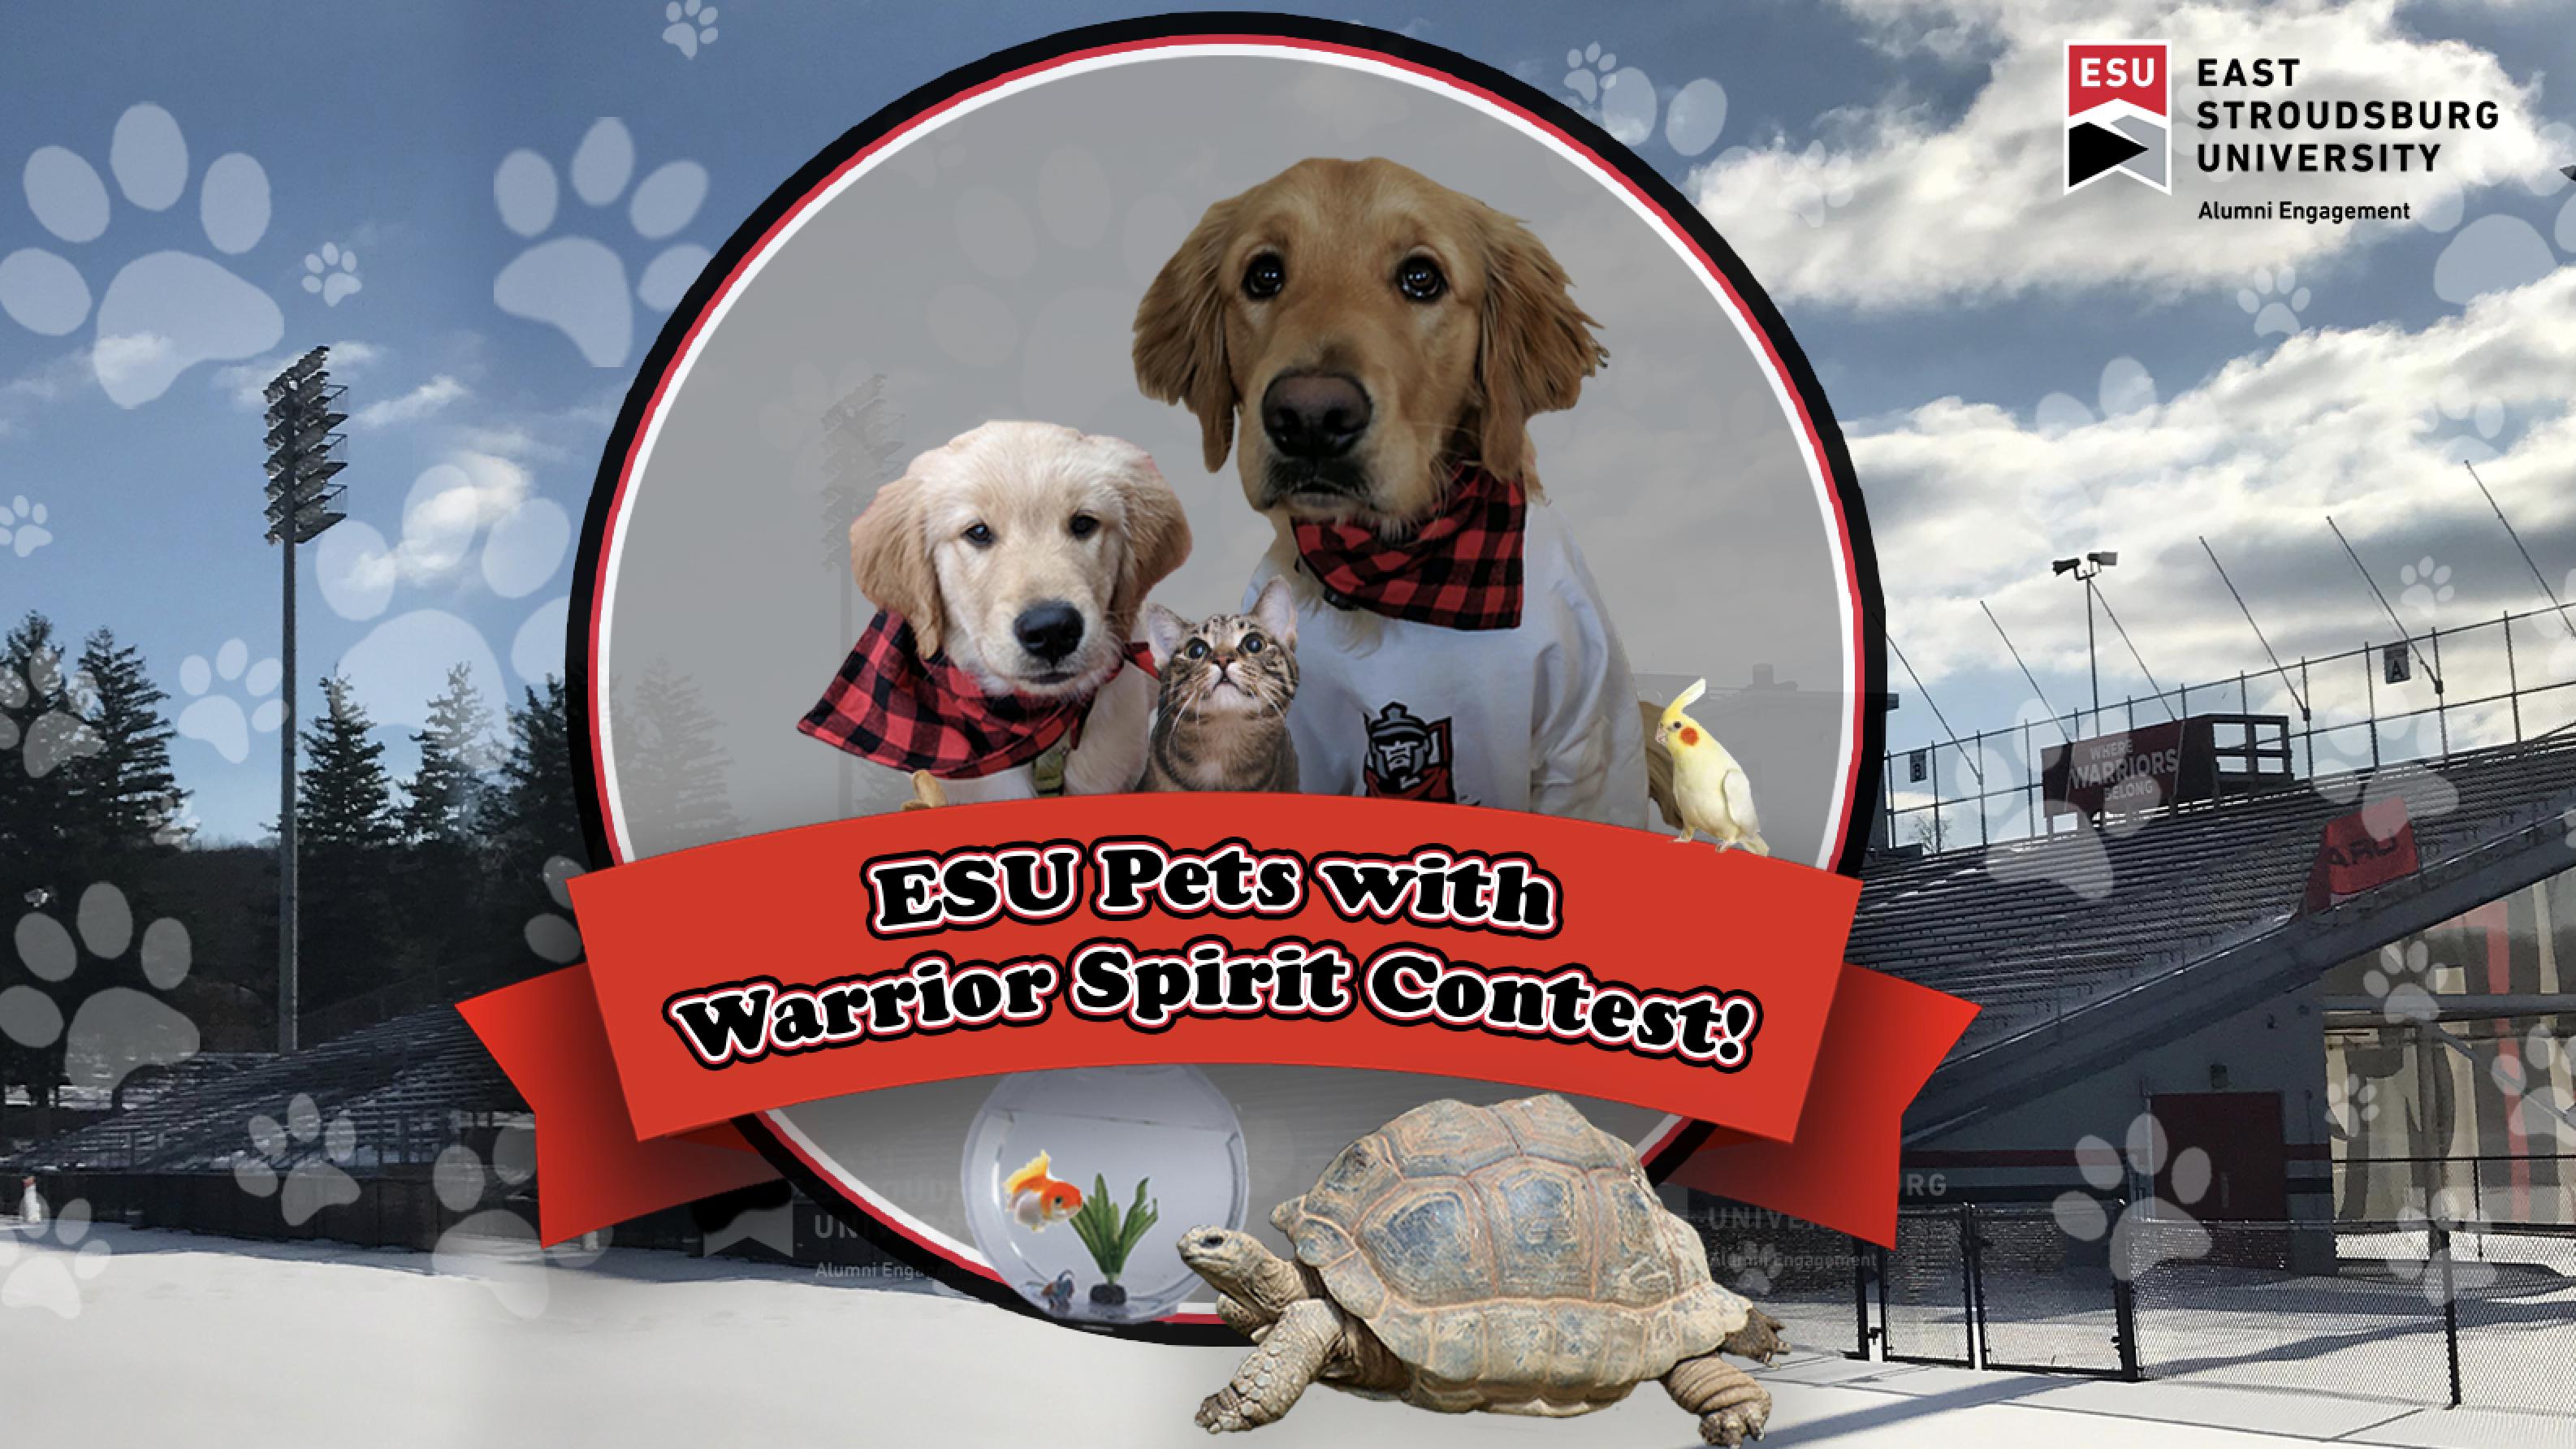 Enter the ESU Alumni Pets with Warrior Spirit Contest